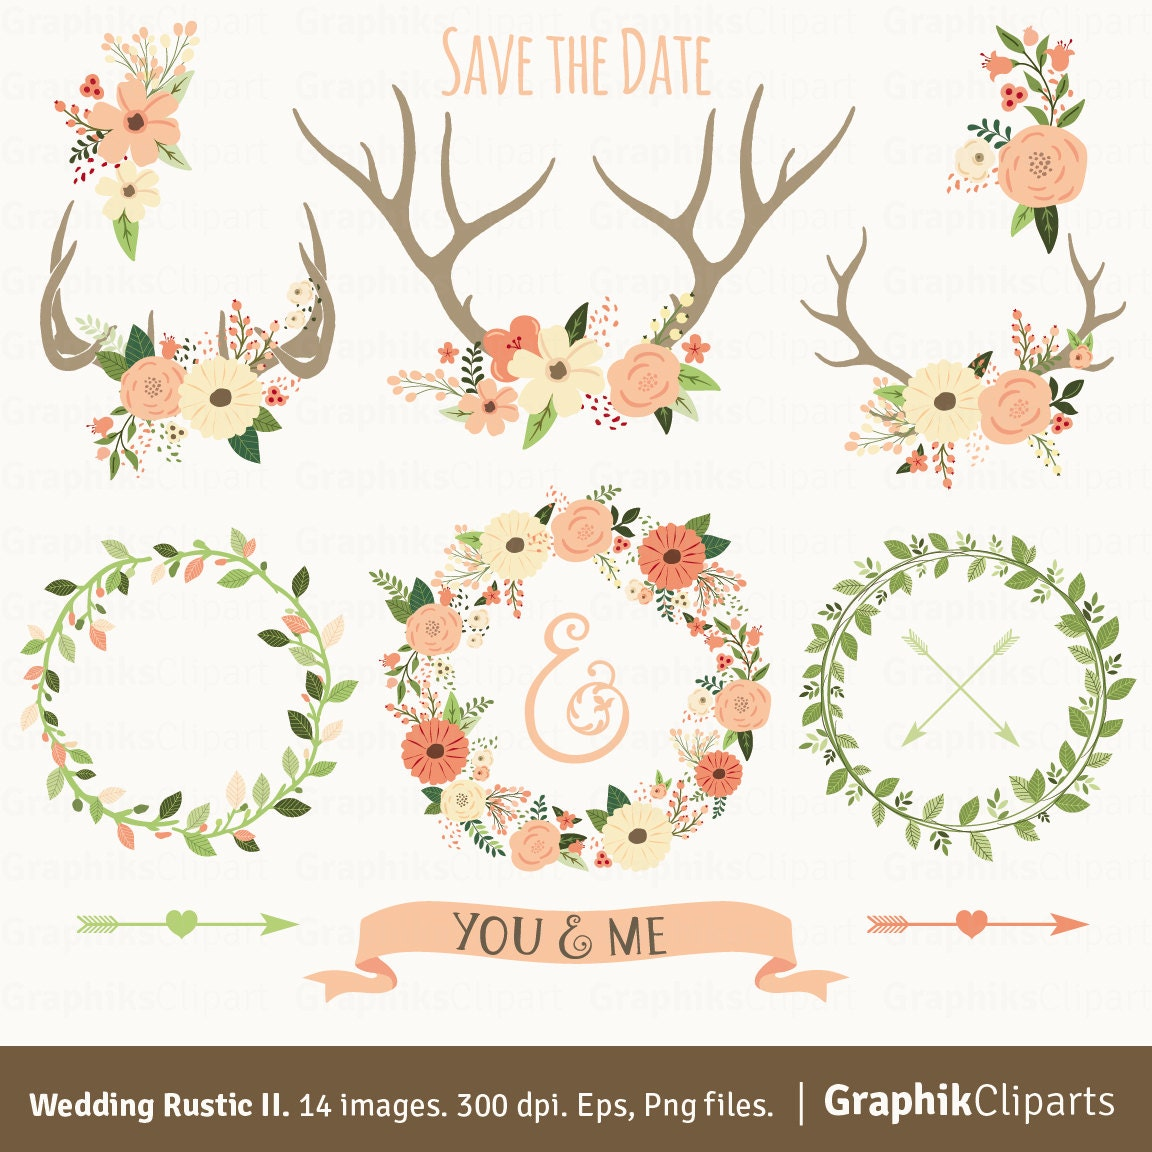 rustic wedding clipart ii floral antlers floral wreaths rh etsy com rustic wedding clipart free download rustic wedding clipart free download